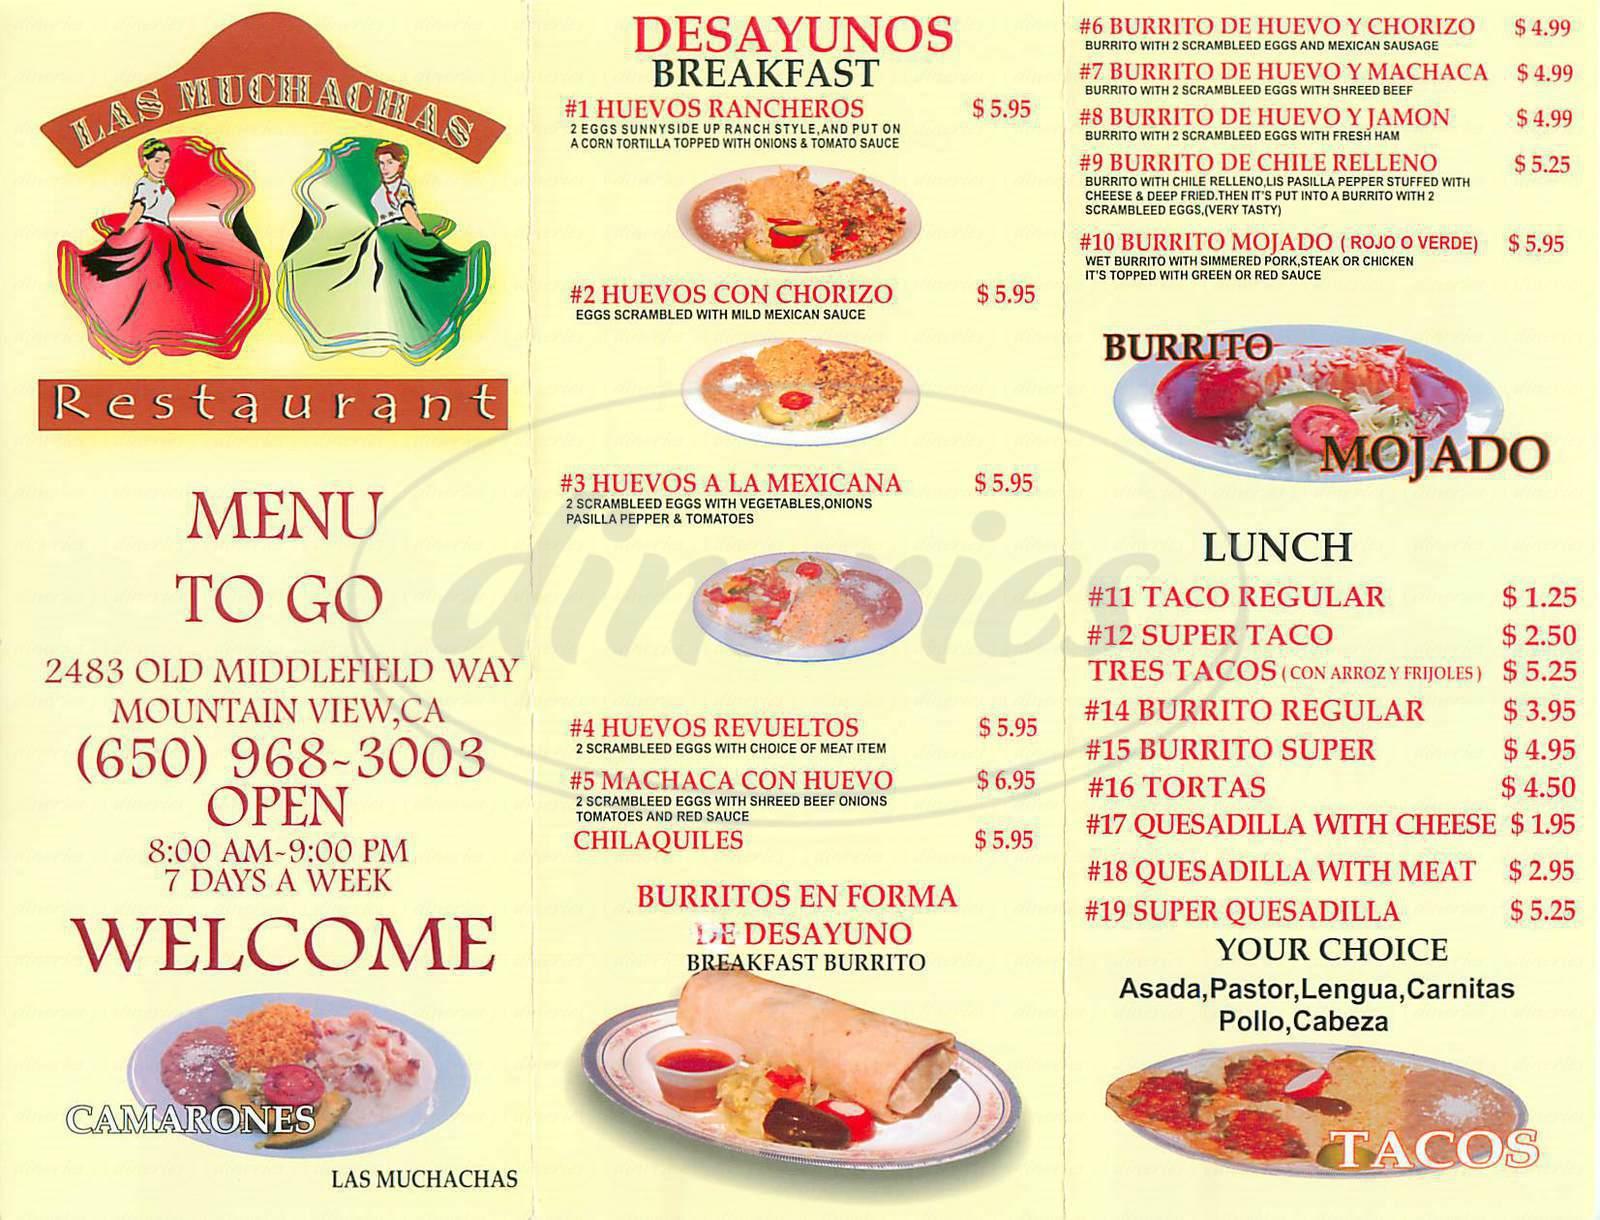 menu for Las Muchachas